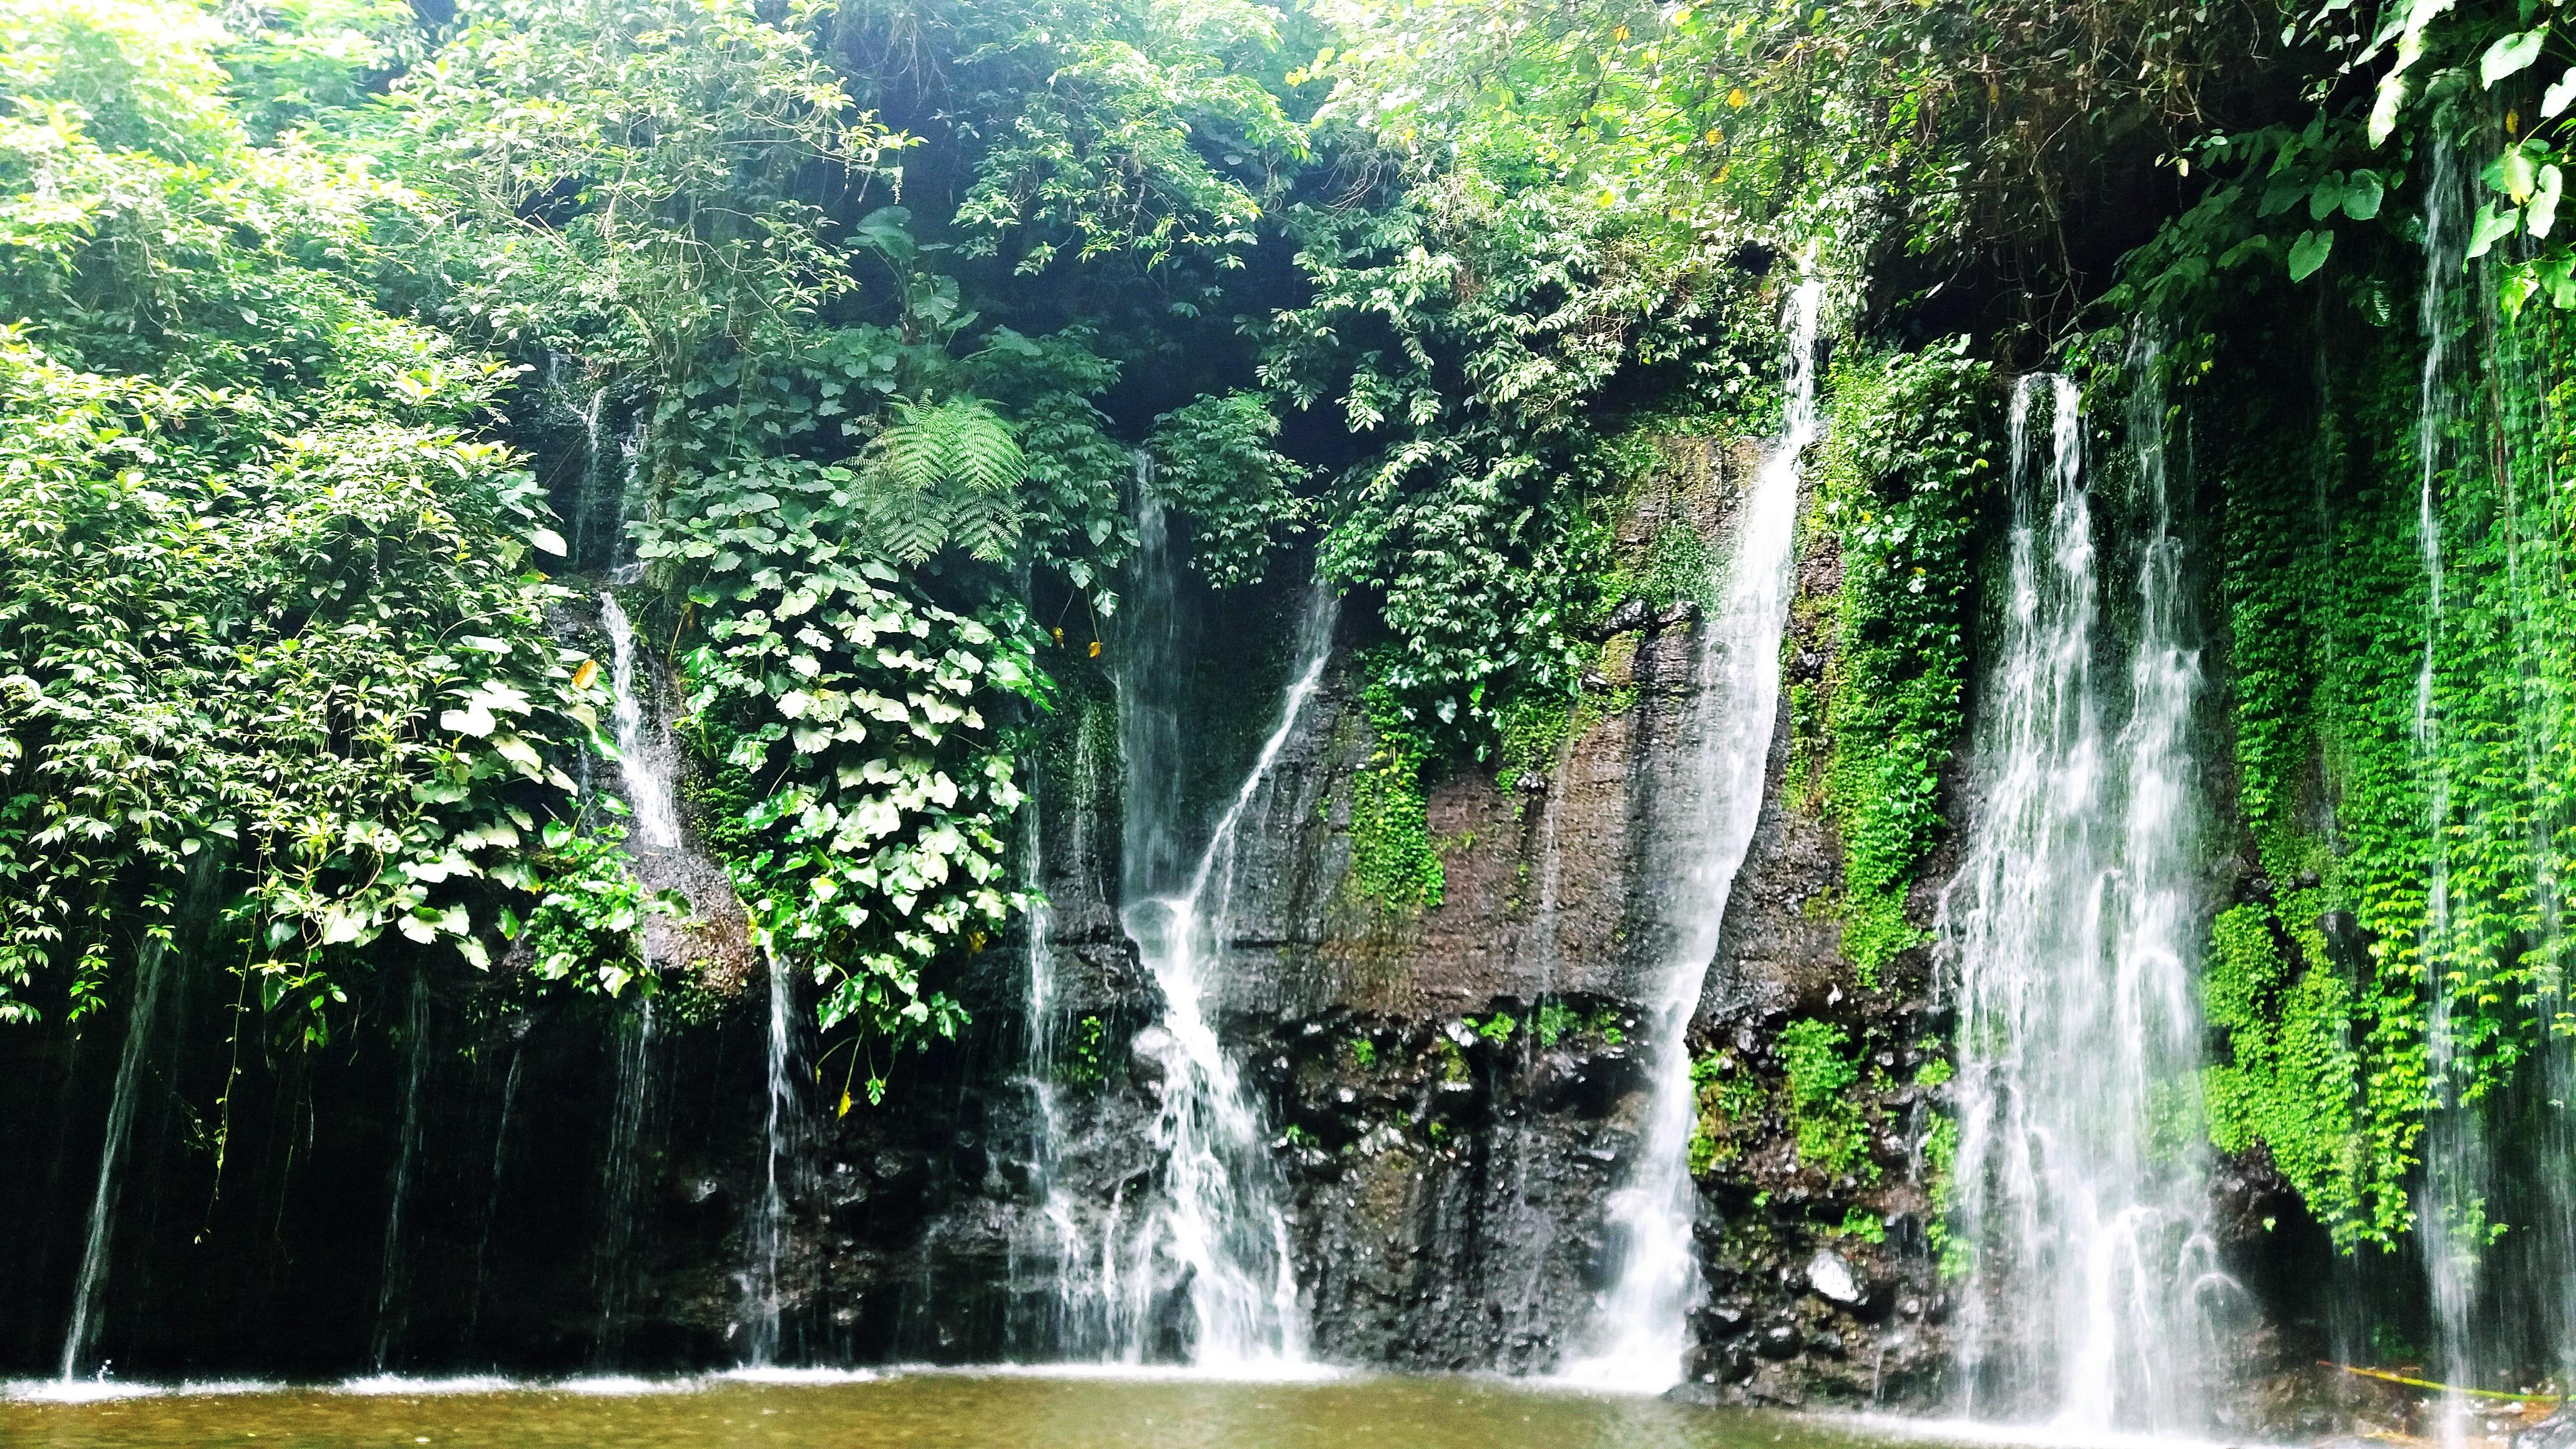 File:Air Terjun Curug Sibedil, Moga, Pemalang, Jawa Tengah